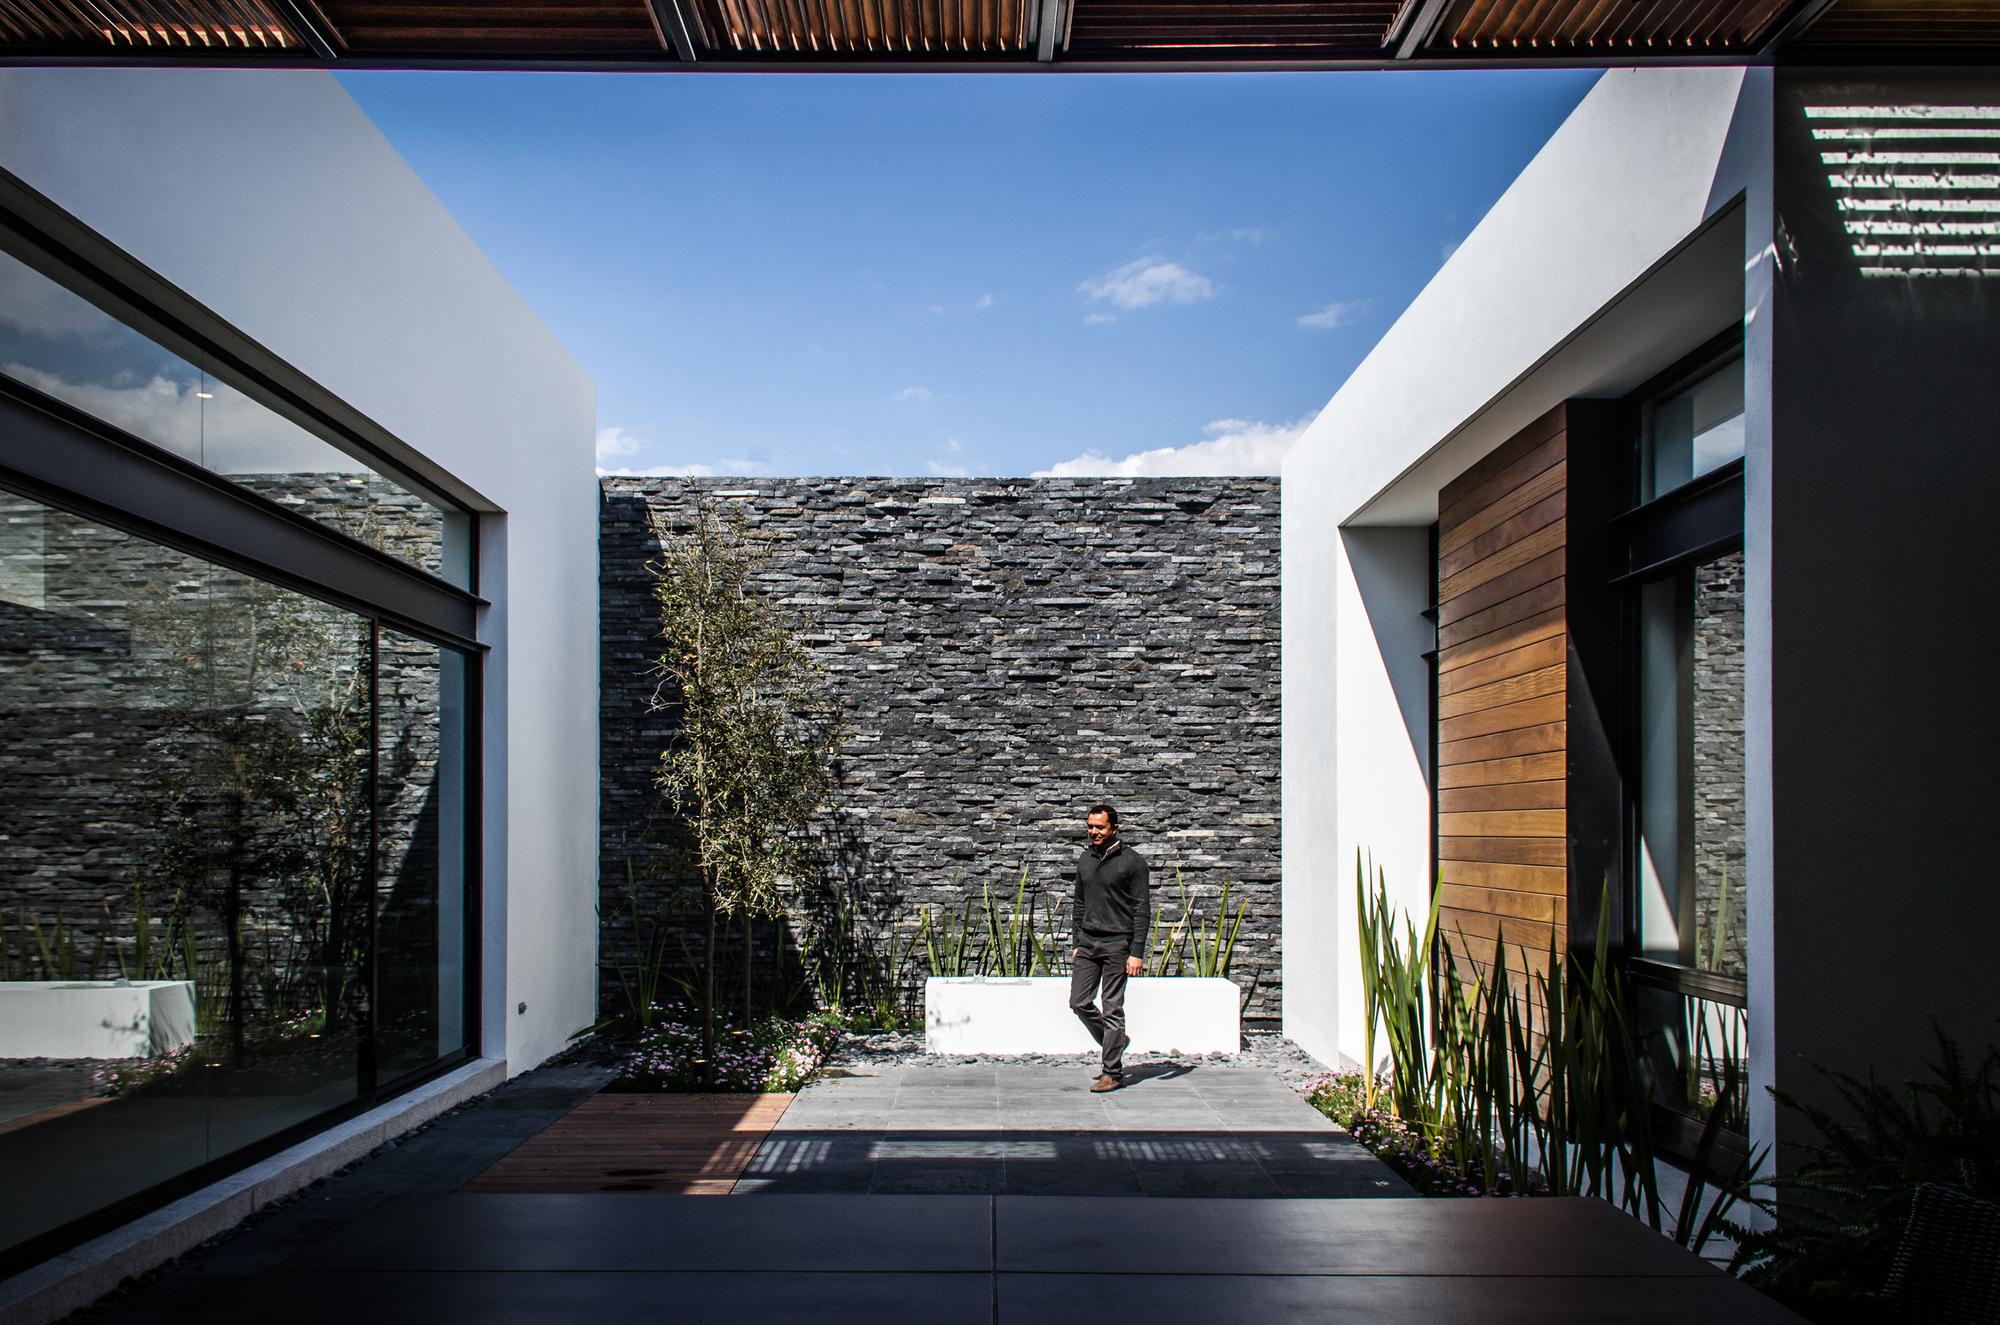 Casa agr adi arquitectura y dise o interior archdaily colombia - Arquitectura interior ...